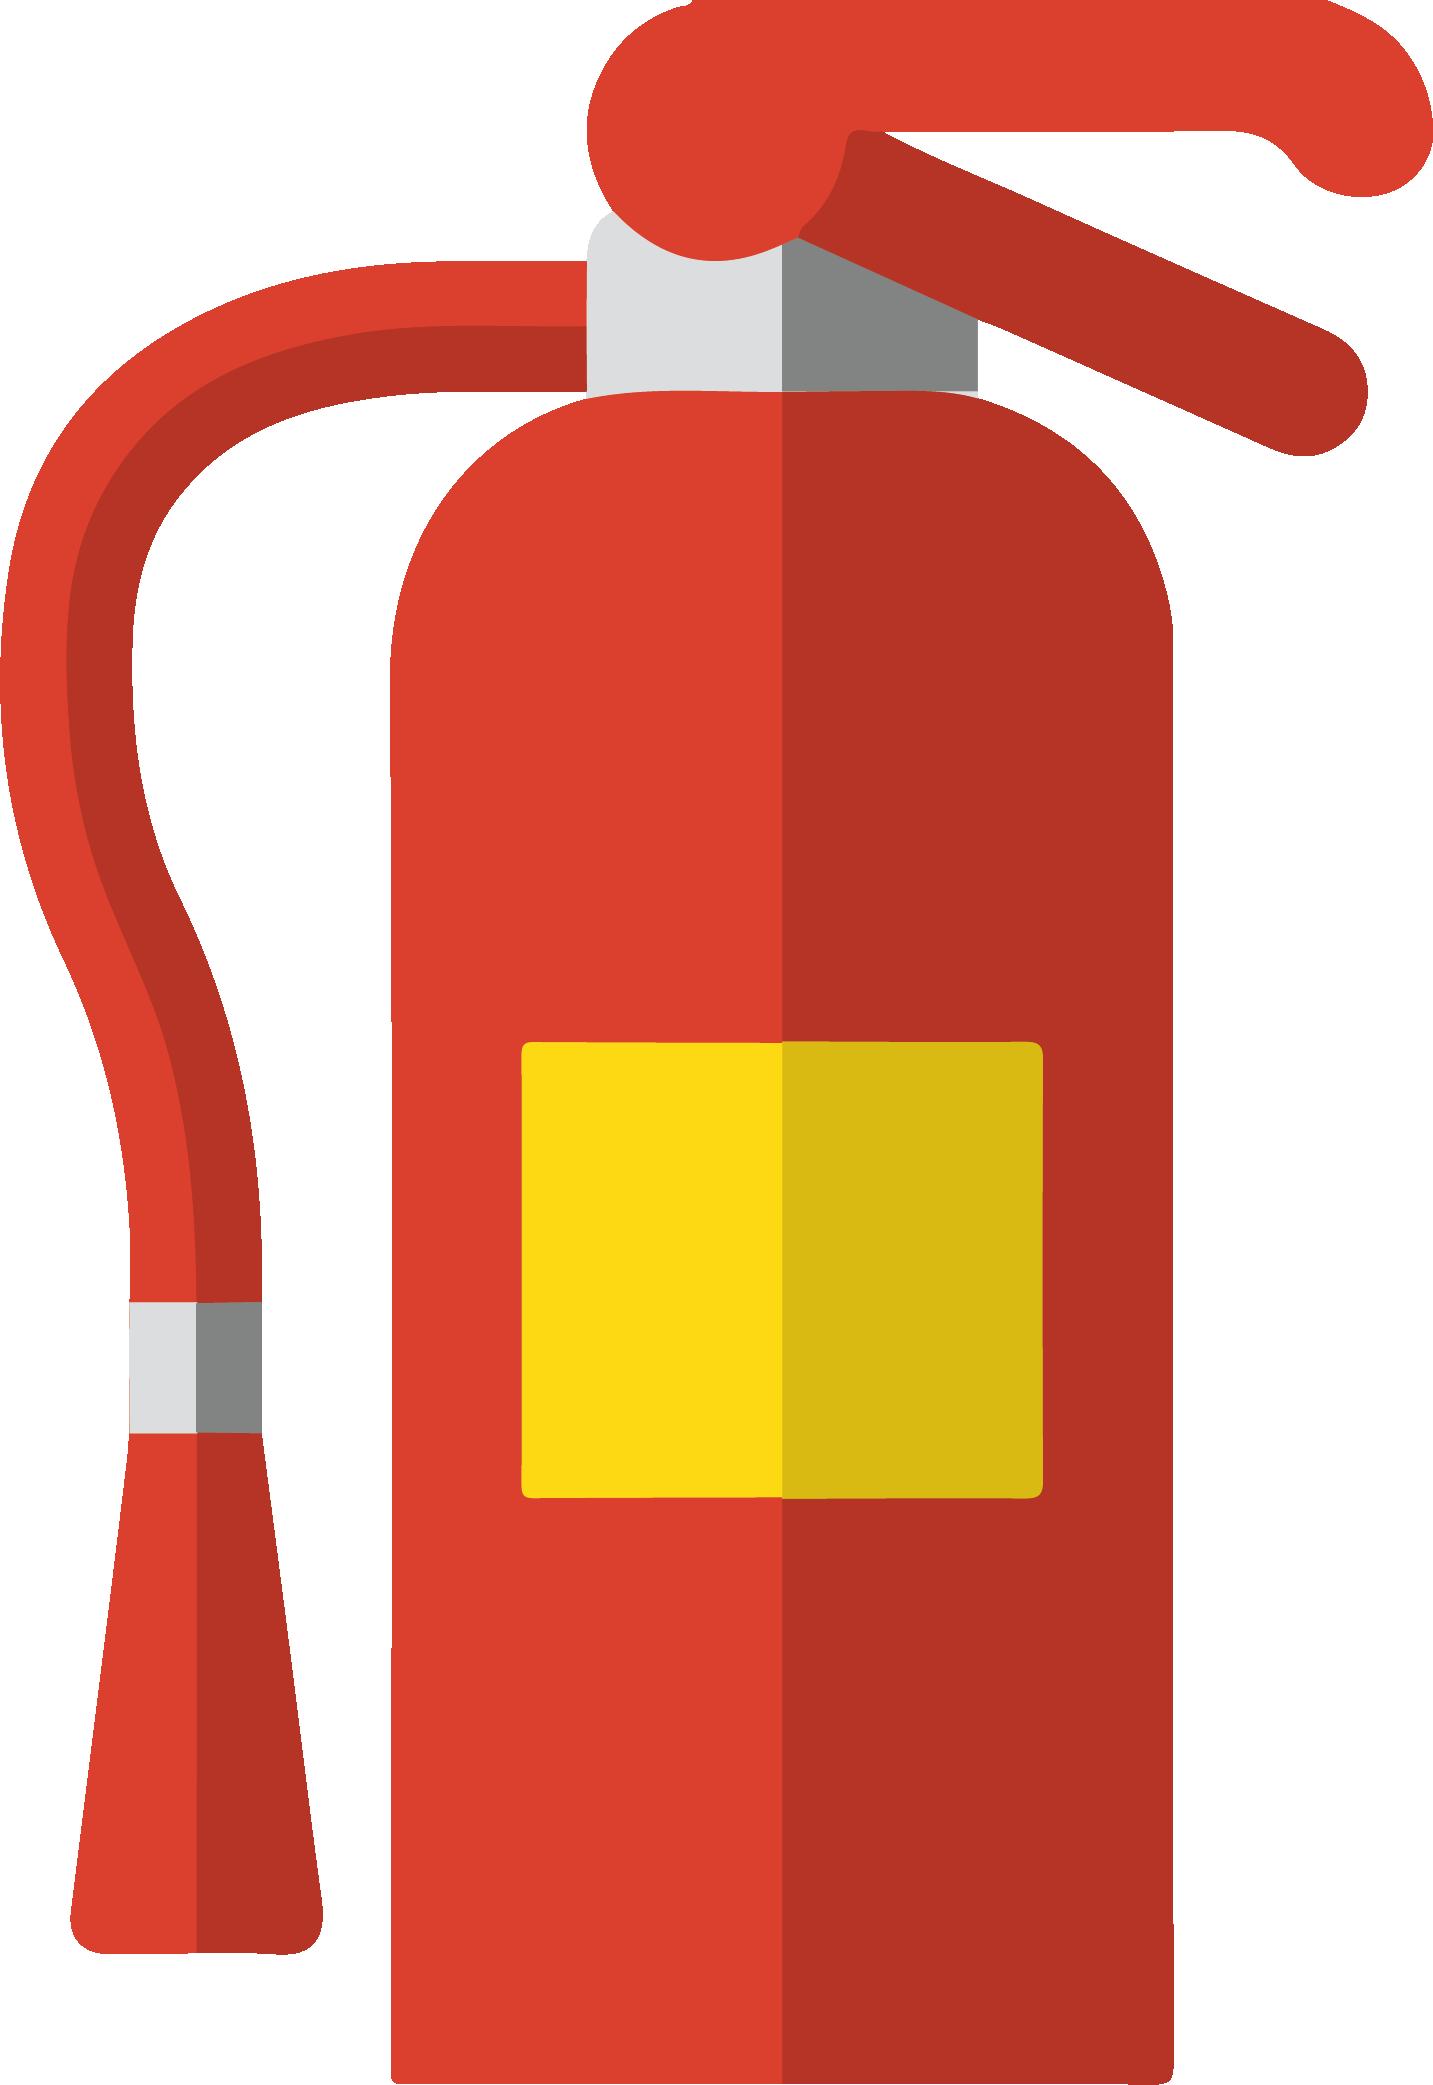 Extinguisher Png Image Extinguisher Png Images Png